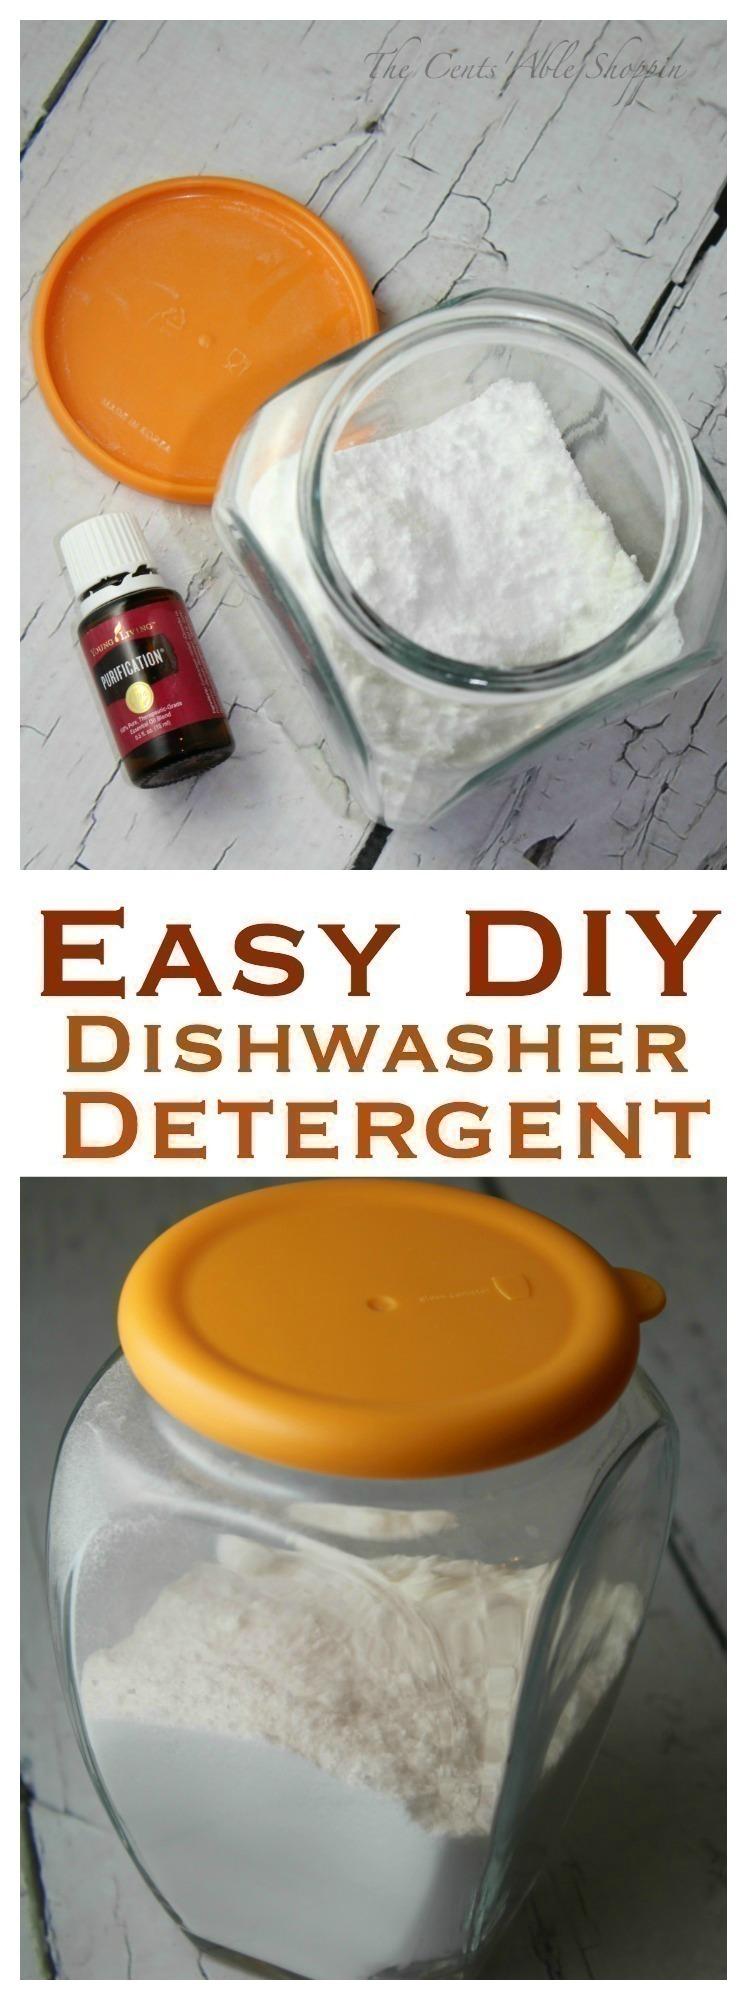 Easy DIY Homemade Dishwasher Detergent